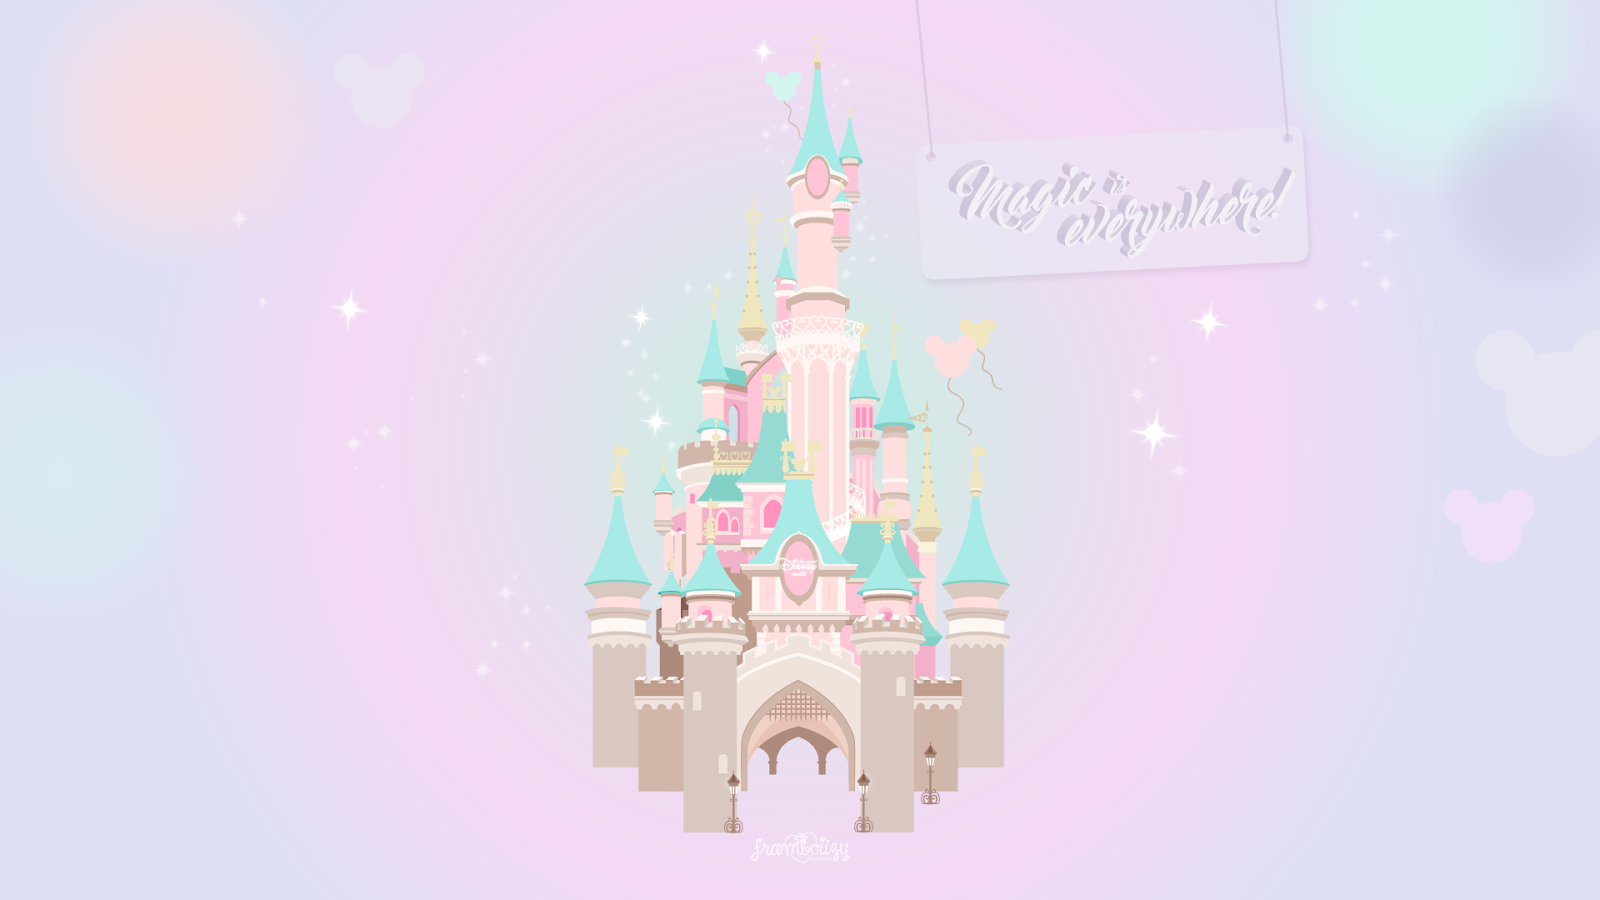 Wallpaper 04 La Magie Disney Goodies Framboiizy